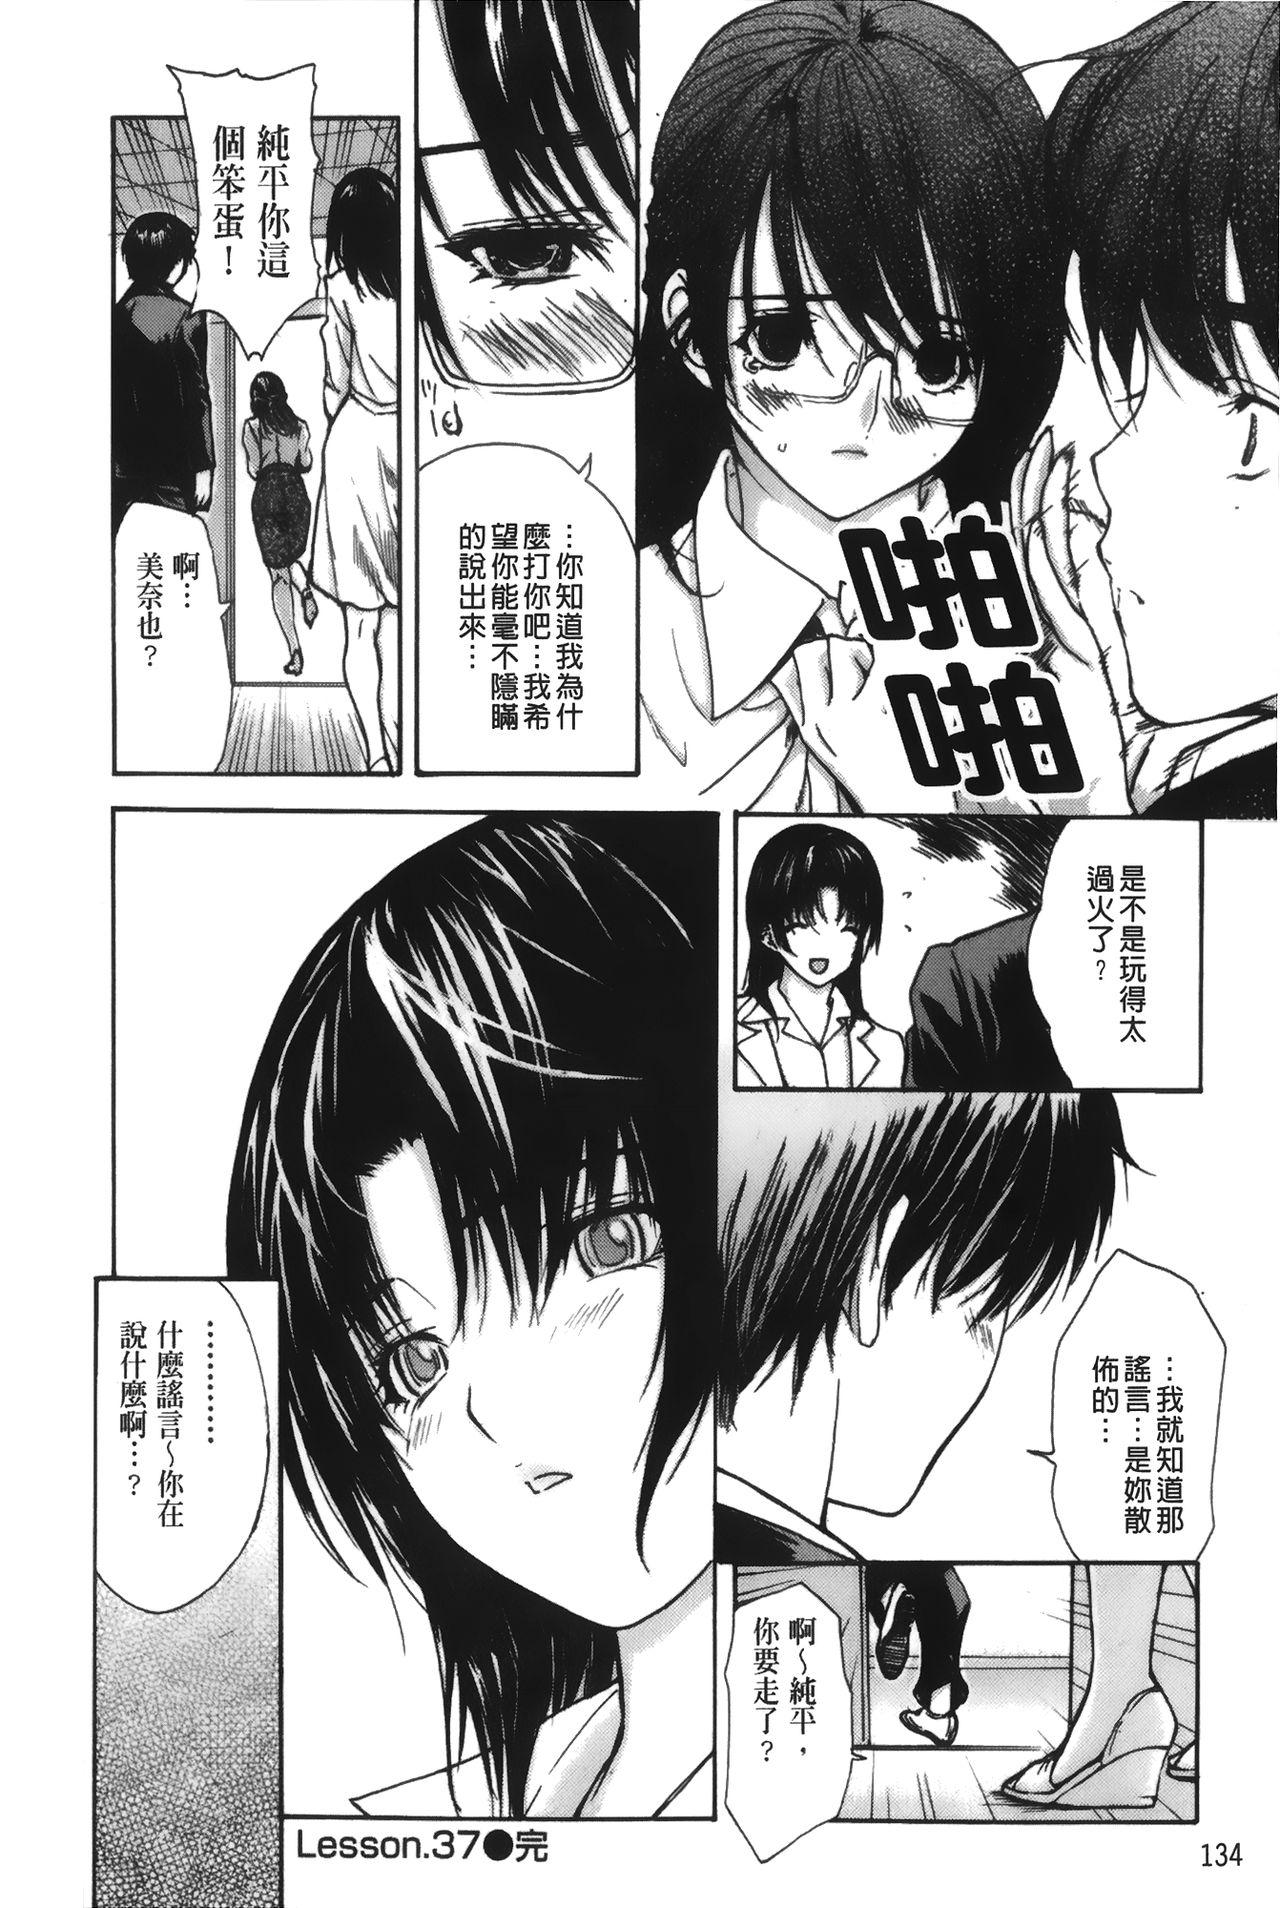 Tonari no Minano Sensei 4 | 隔壁的美奈乃老師 4 135